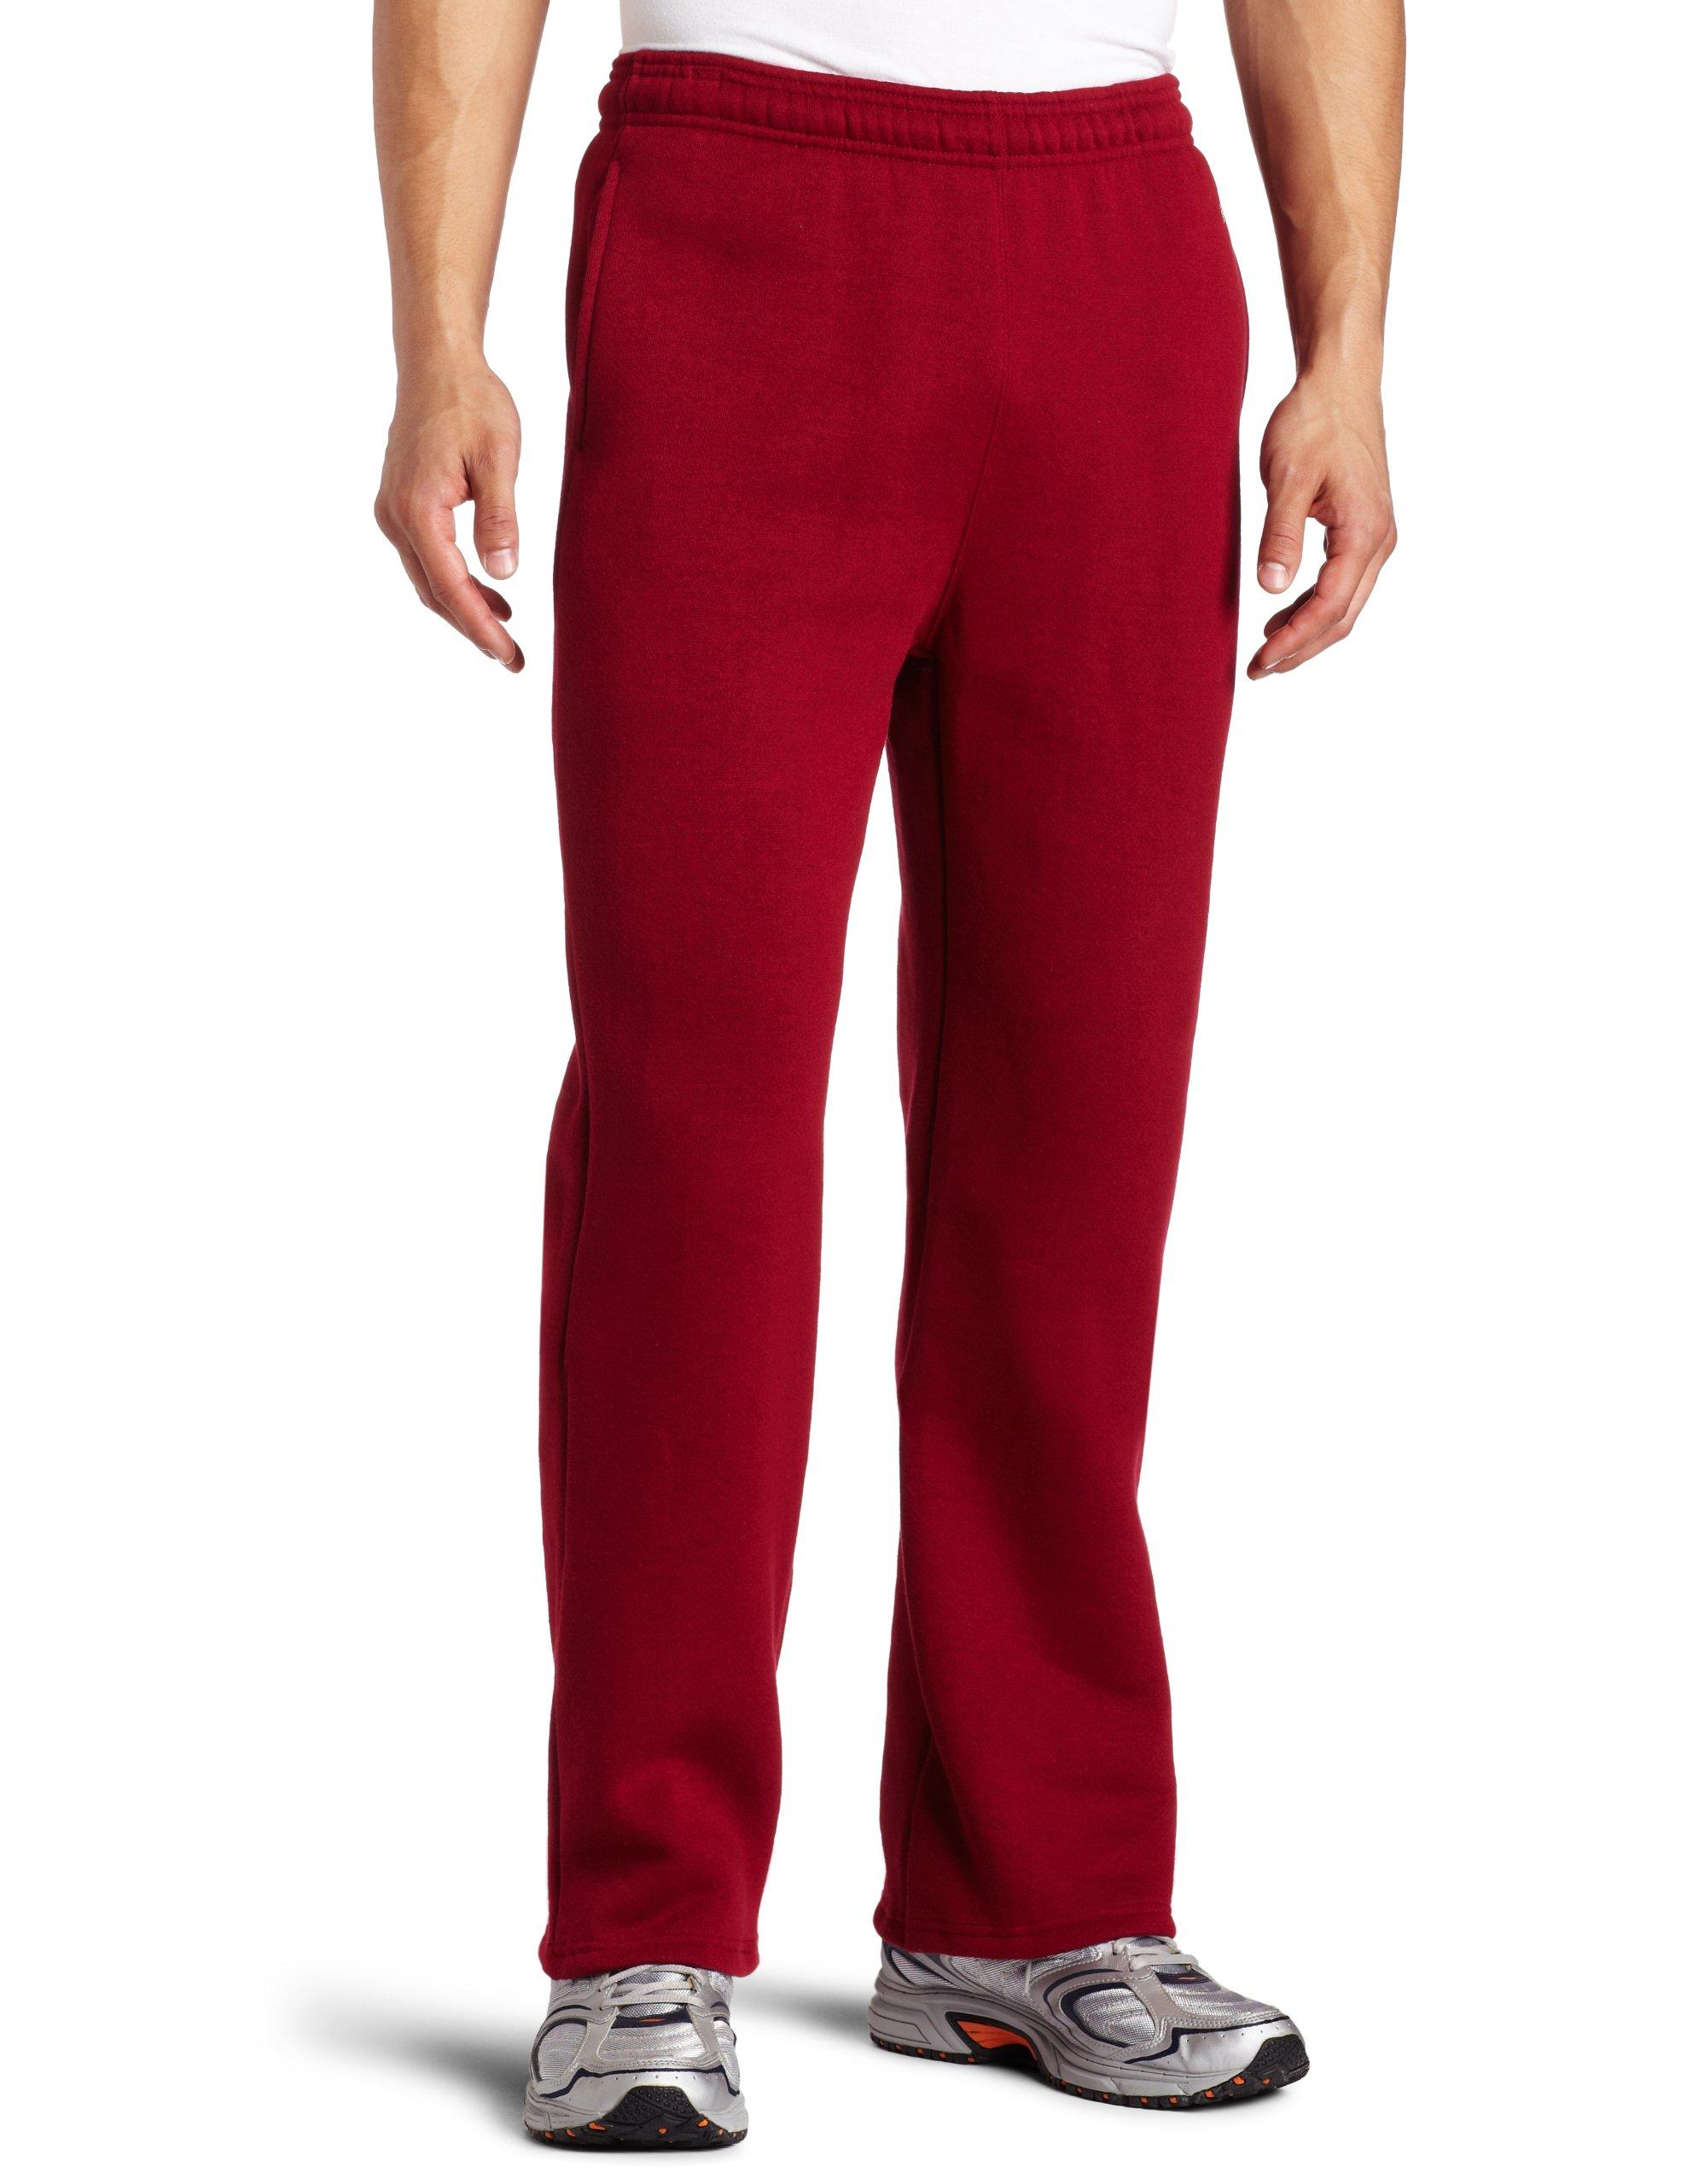 Soffe MJ Men's Training Fleece Pocket Pant, Cardinal Small